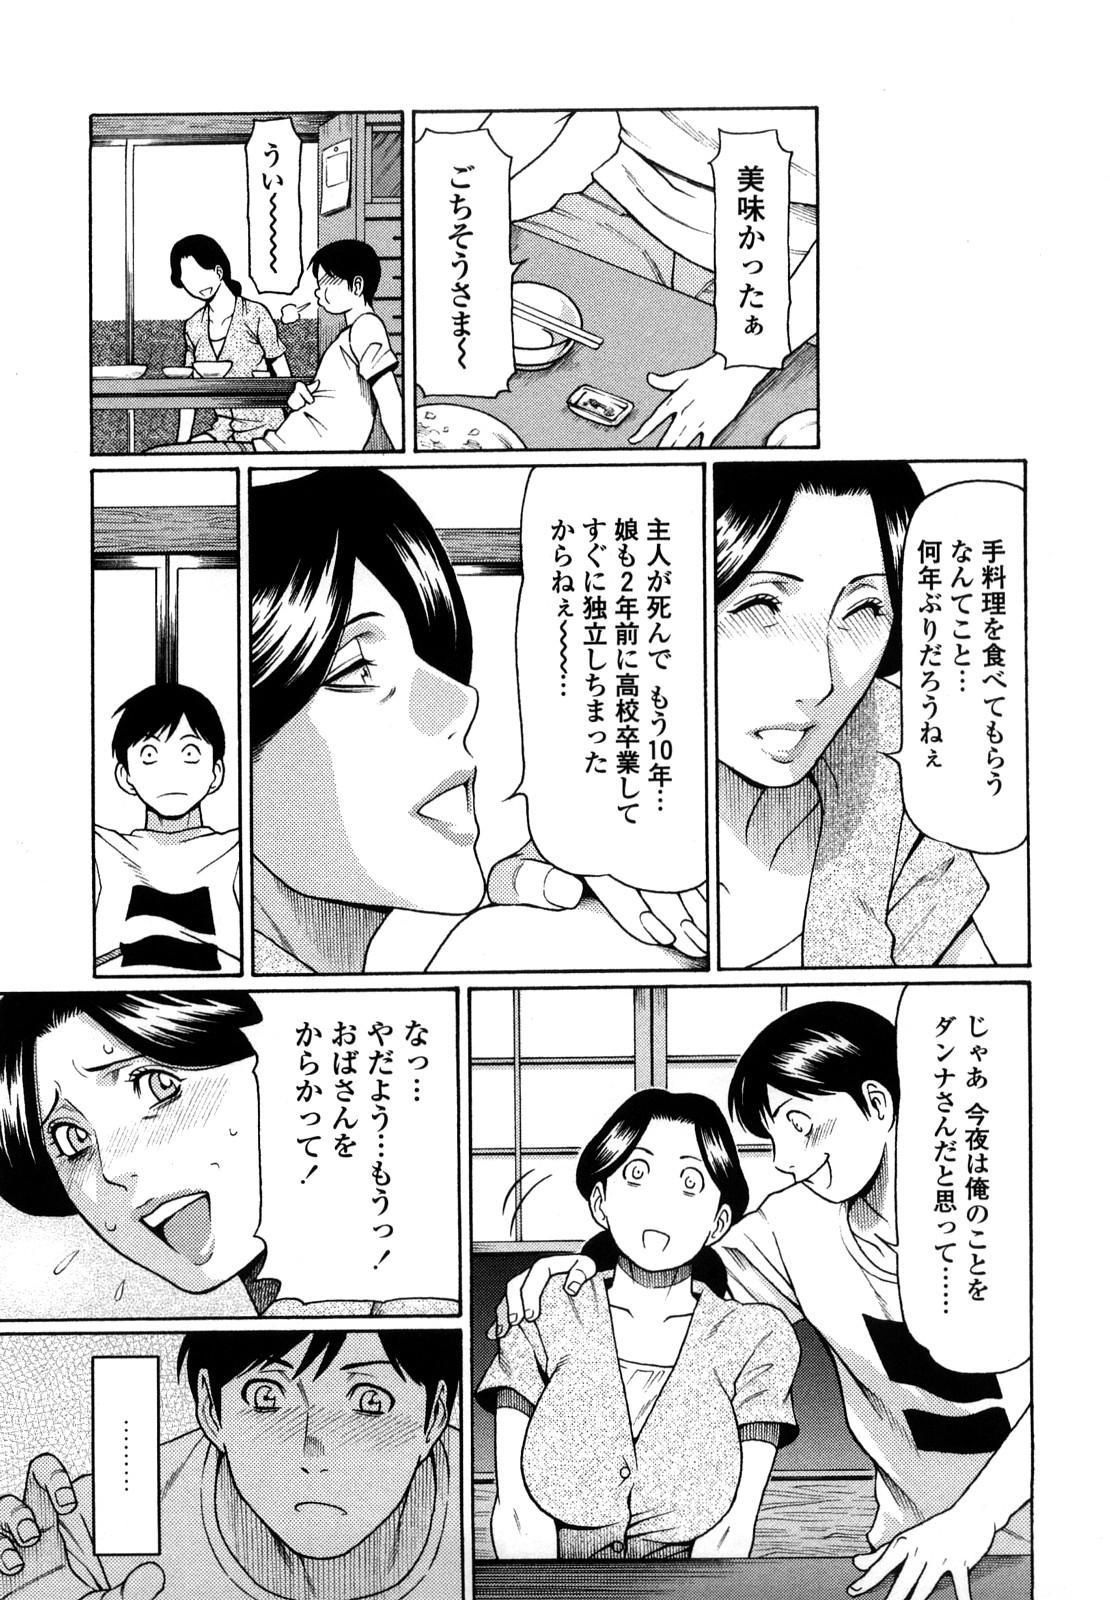 [Takasugi Kou] Kindan no Haha-Ana - Immorality Love-Hole [Decensored] 124